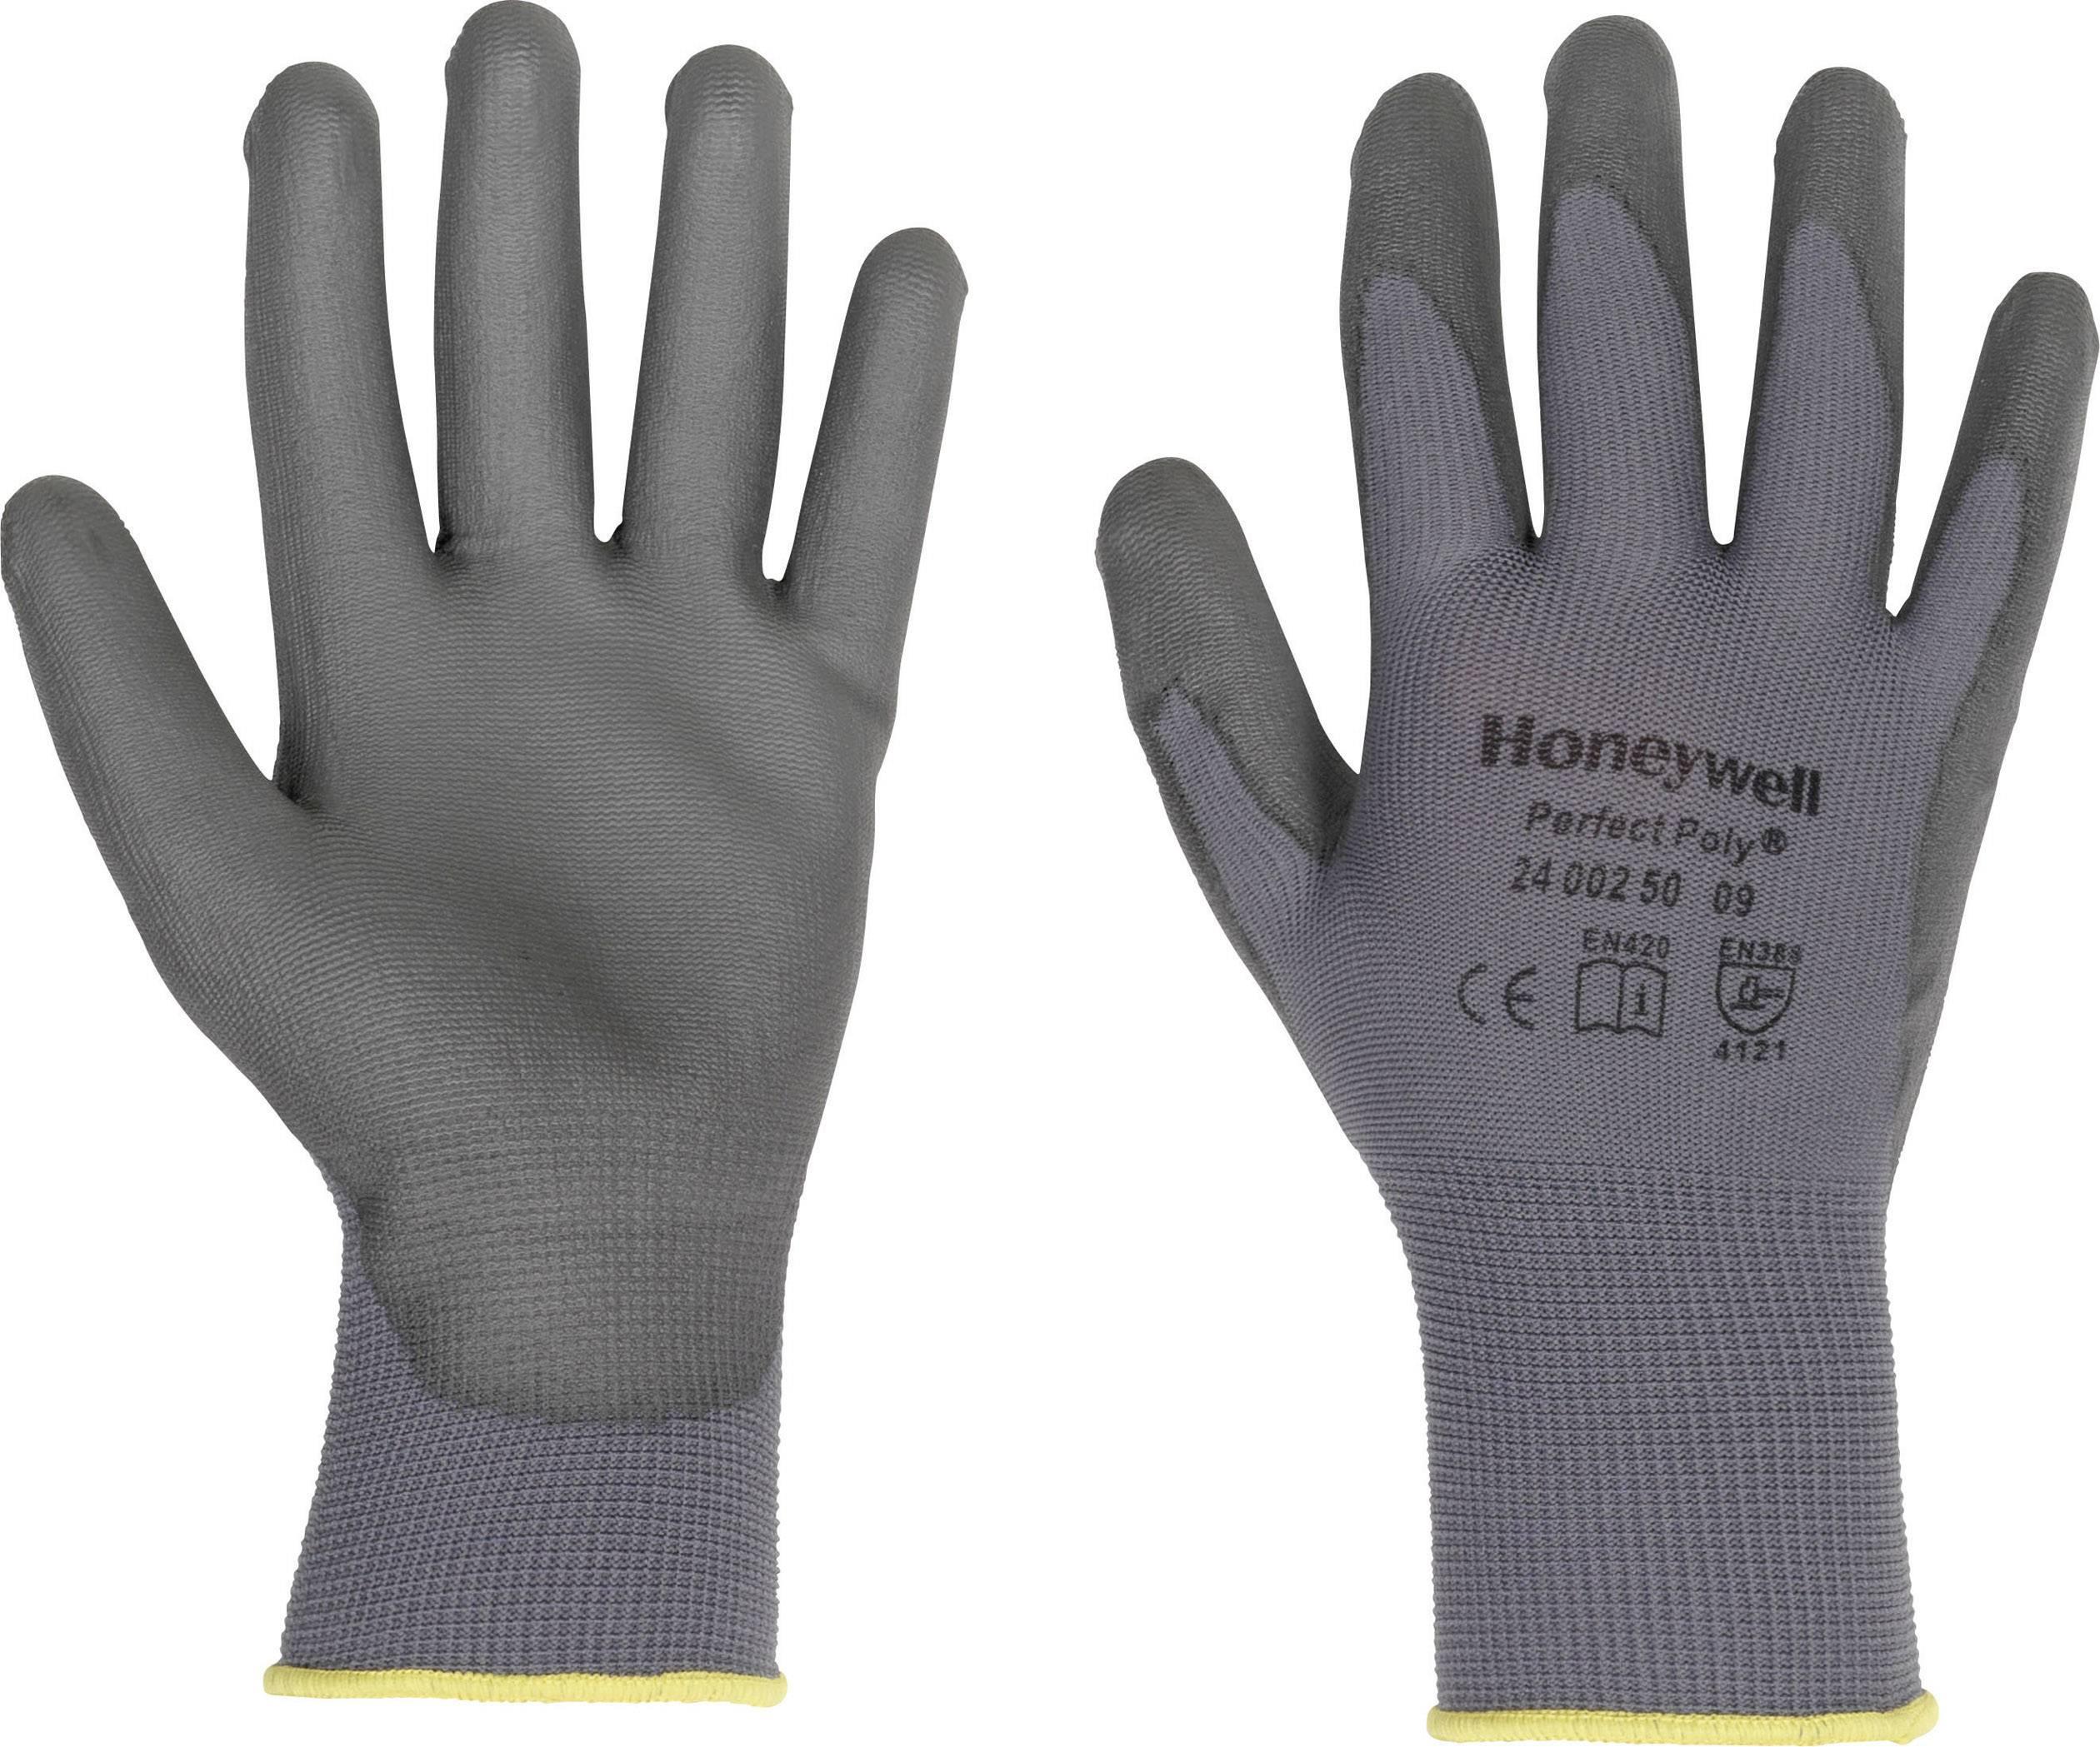 Pracovné rukavice Perfect Fit GANTS GRIS PERFECTPOLY 2400250, velikost rukavic: 8, M